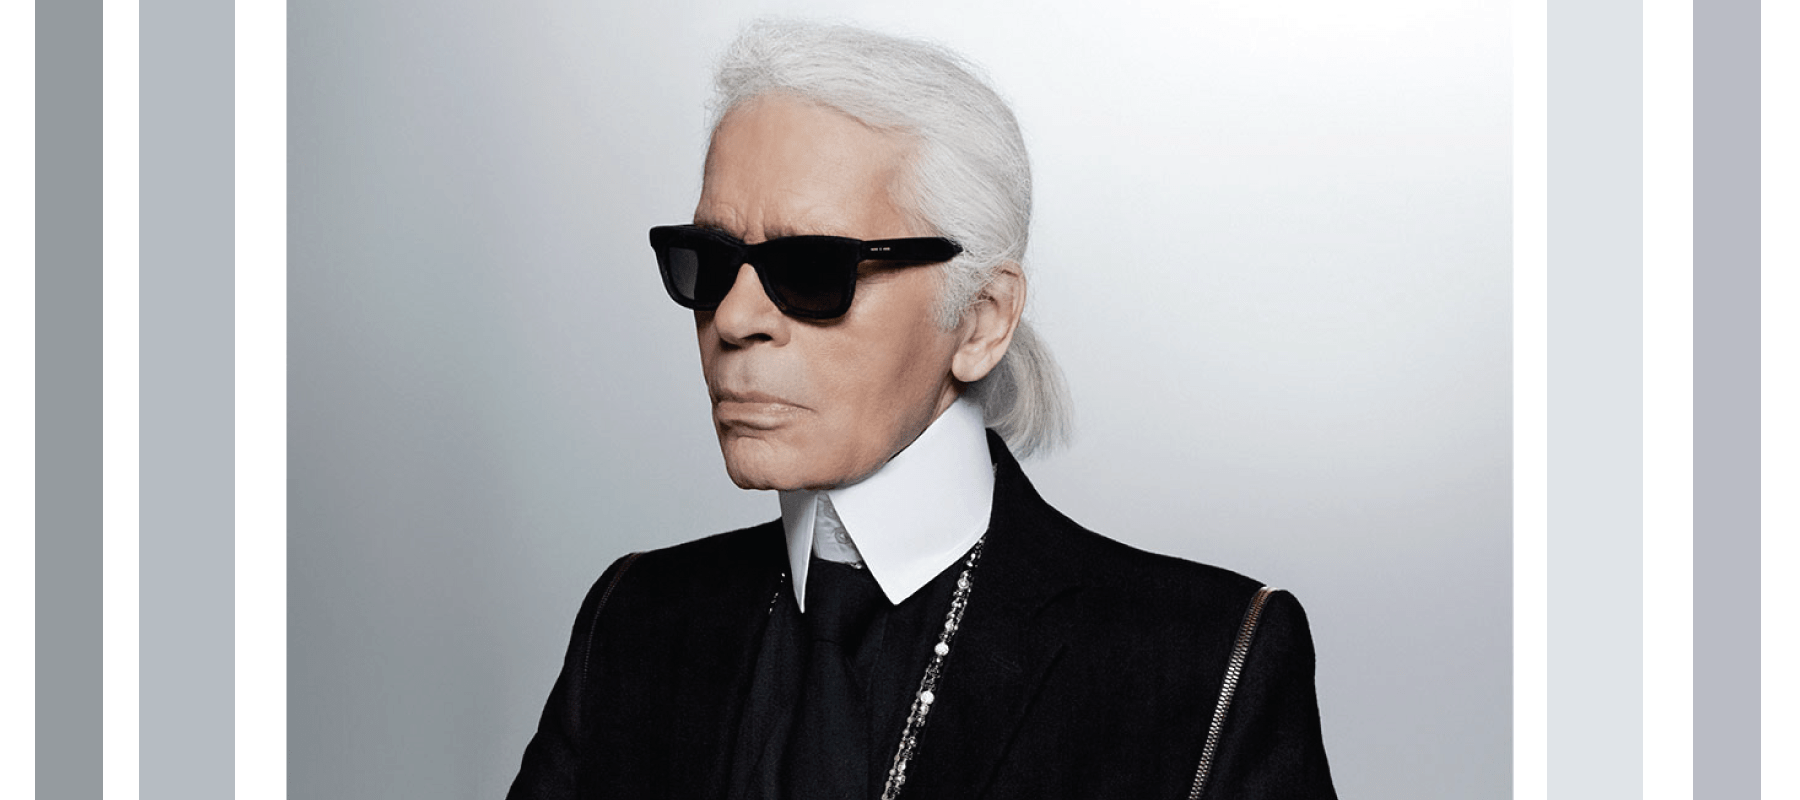 Karl Lagerfeld Dies The End Of An Era For Fashion Fendi Chanel Highxtar